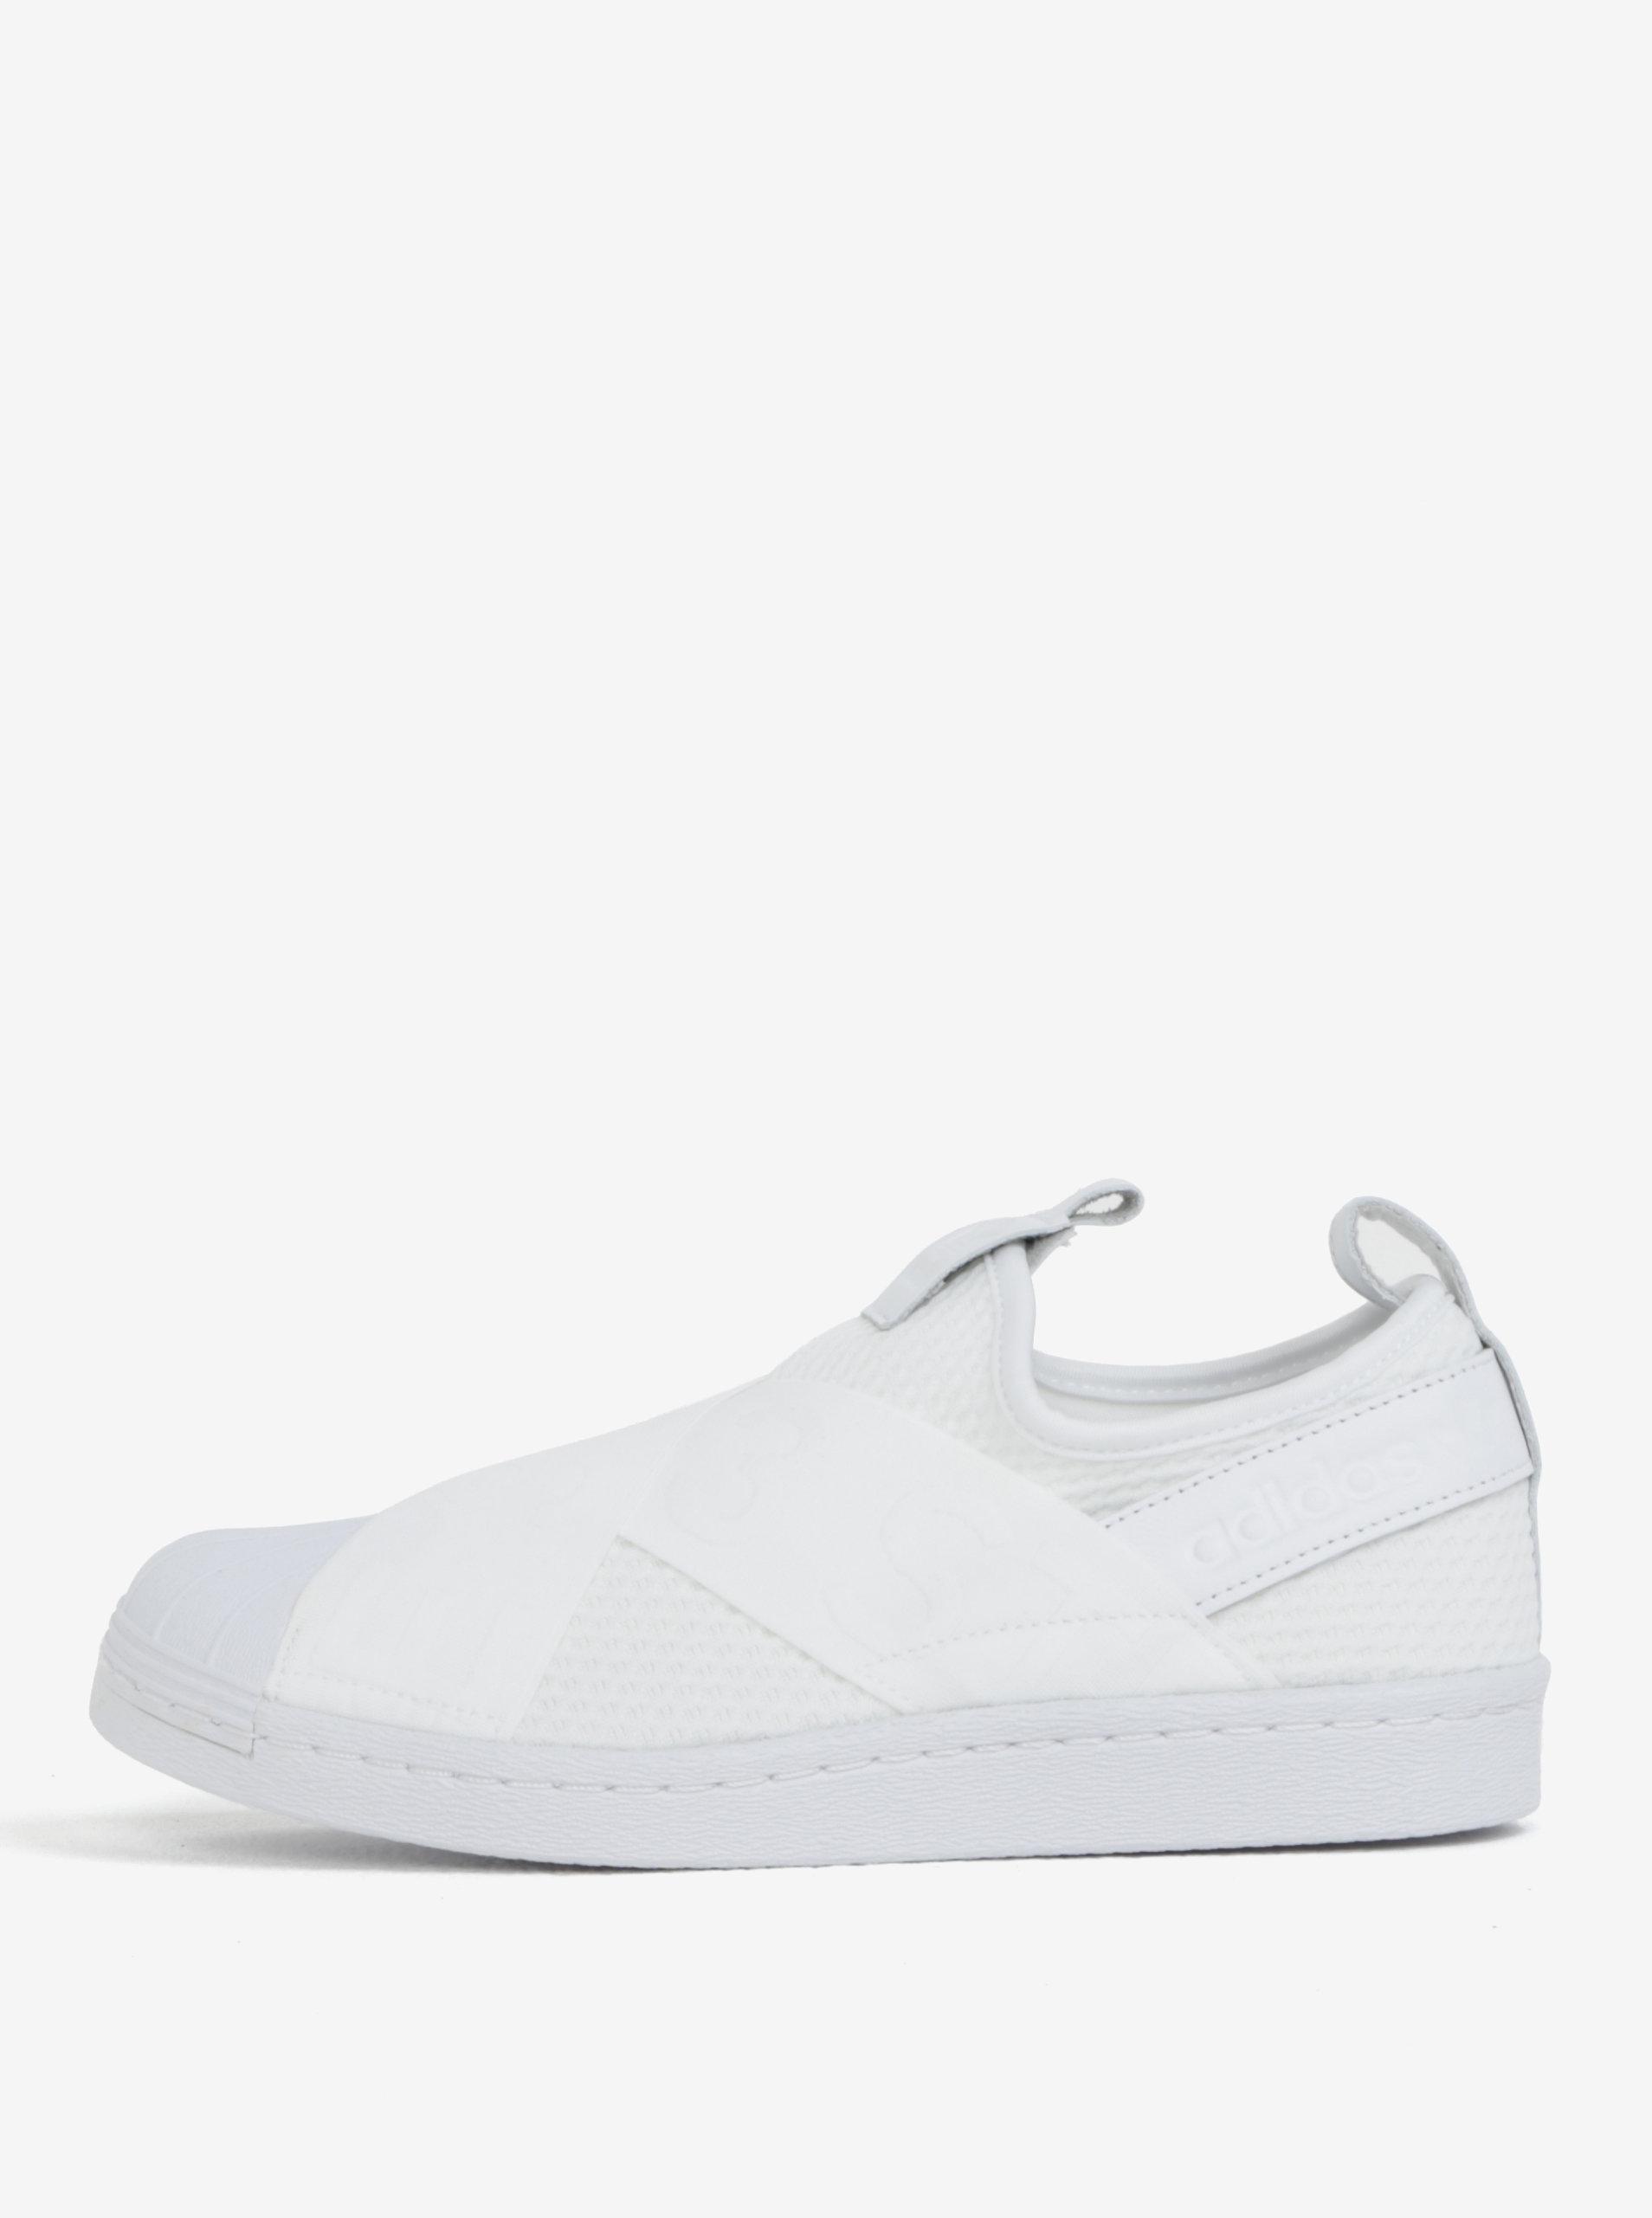 2550620ce23d2 Biele dámske slip on s koženými detailmi adidas Originals Superstar ...